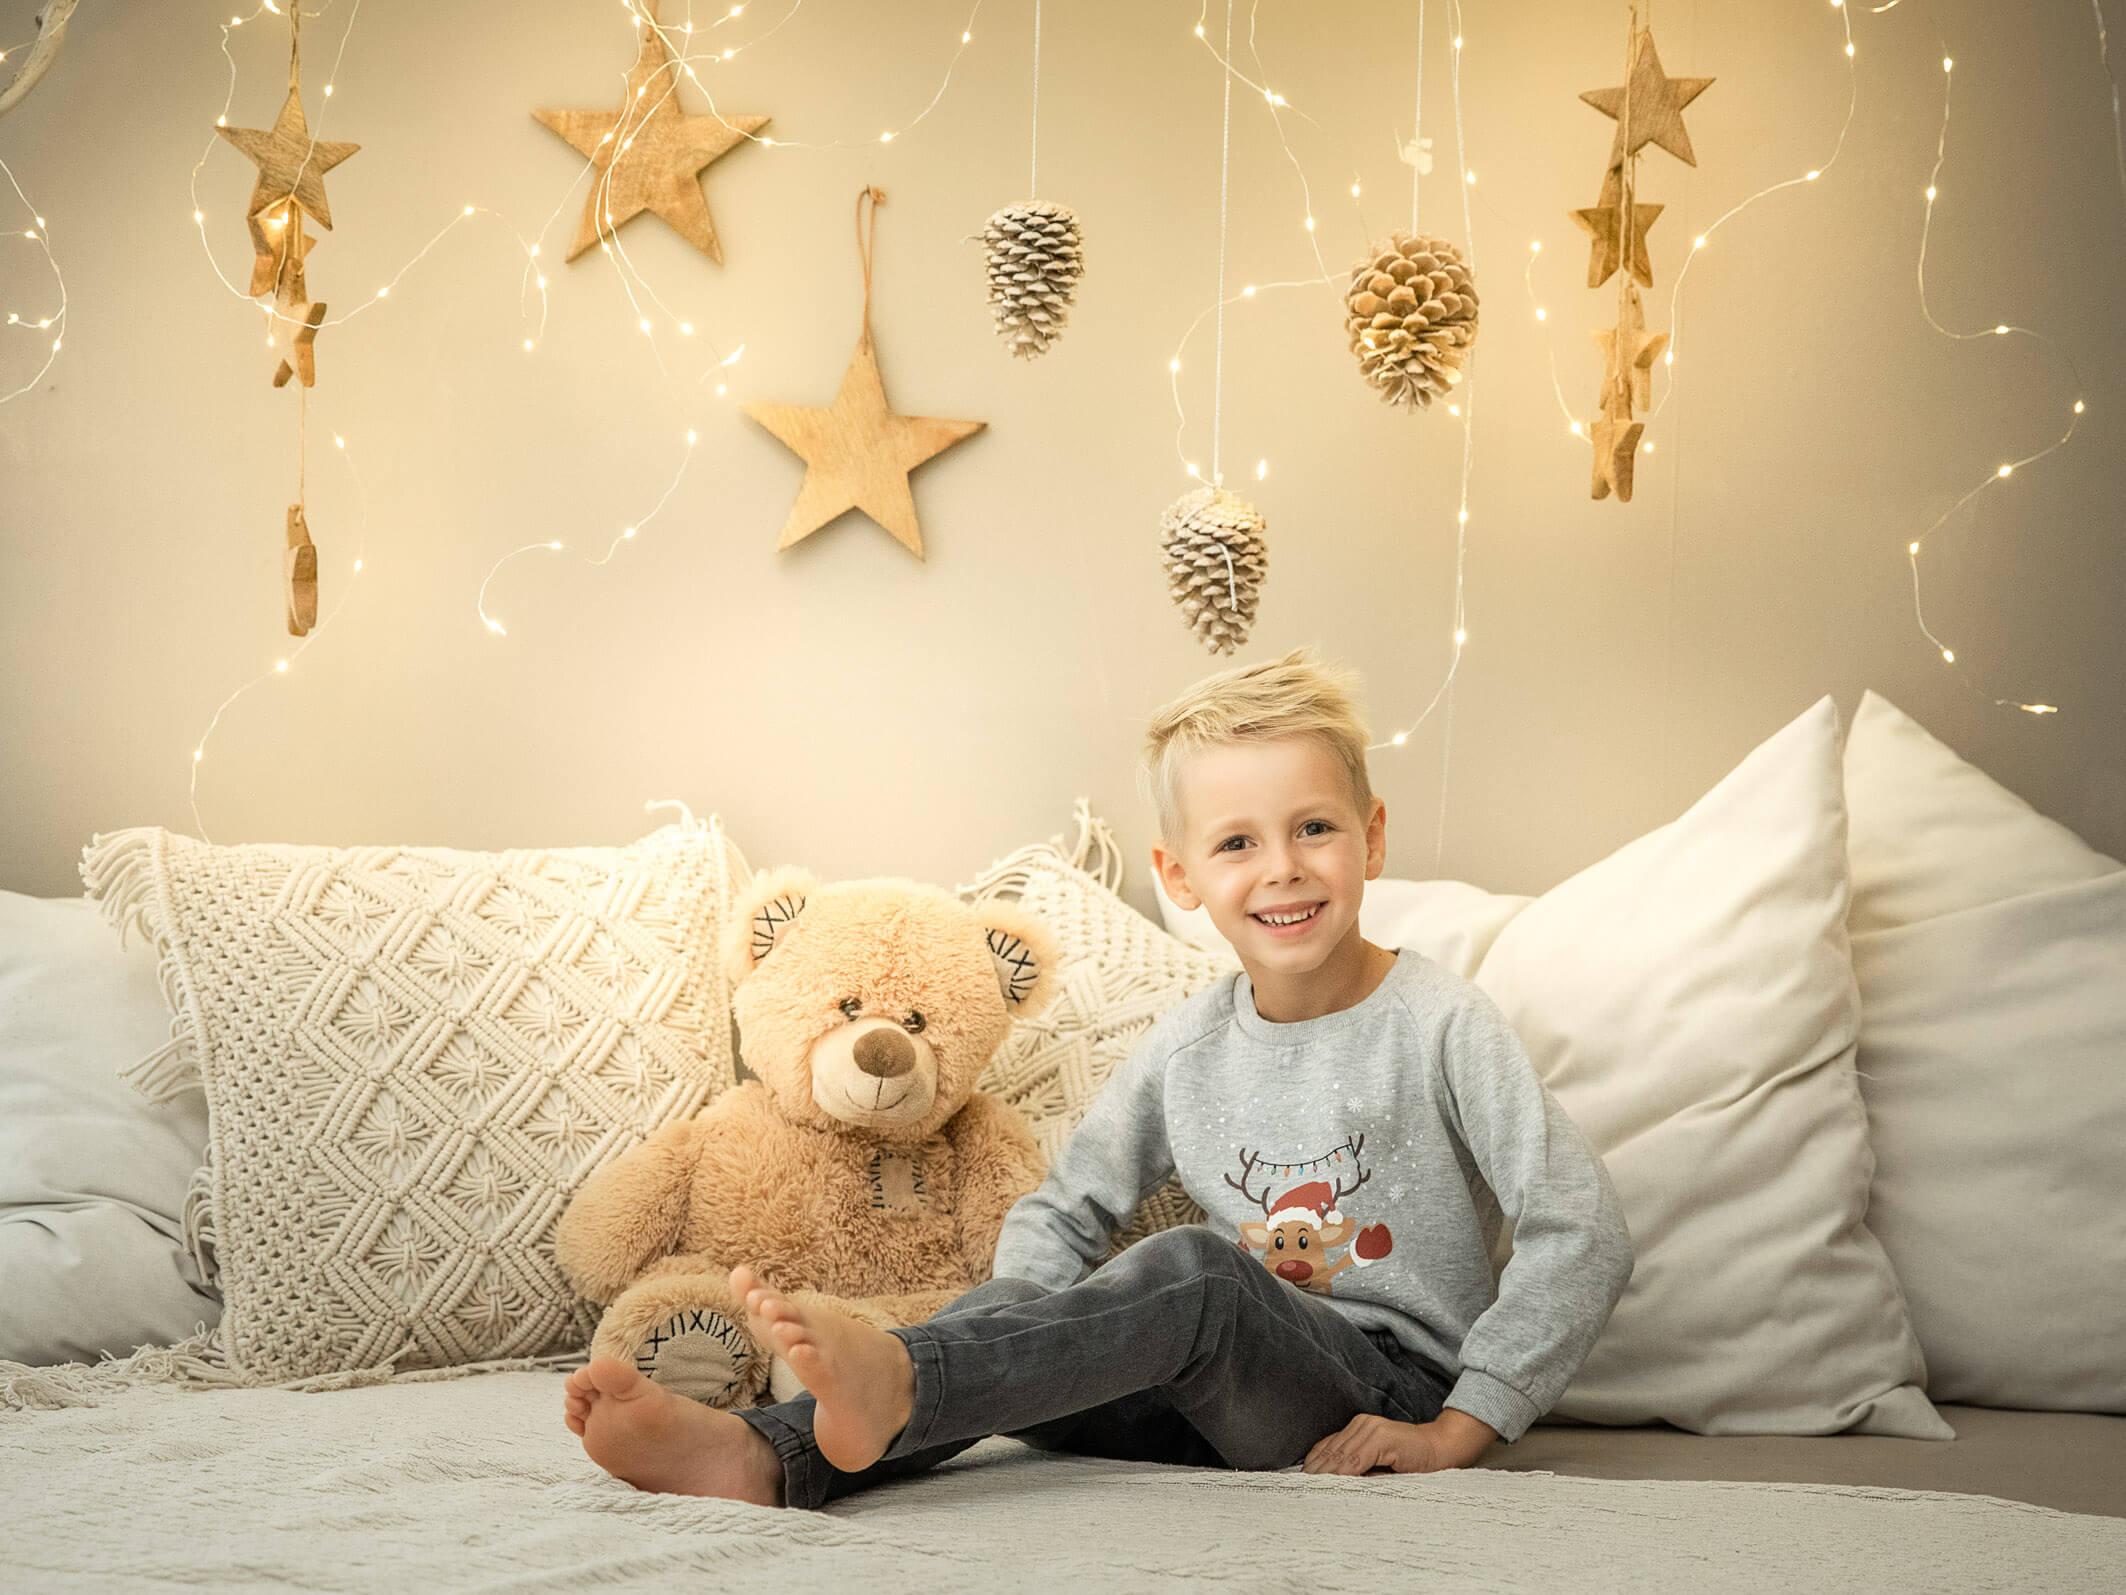 Specialangebot Weihnachtszauber Fotostudio